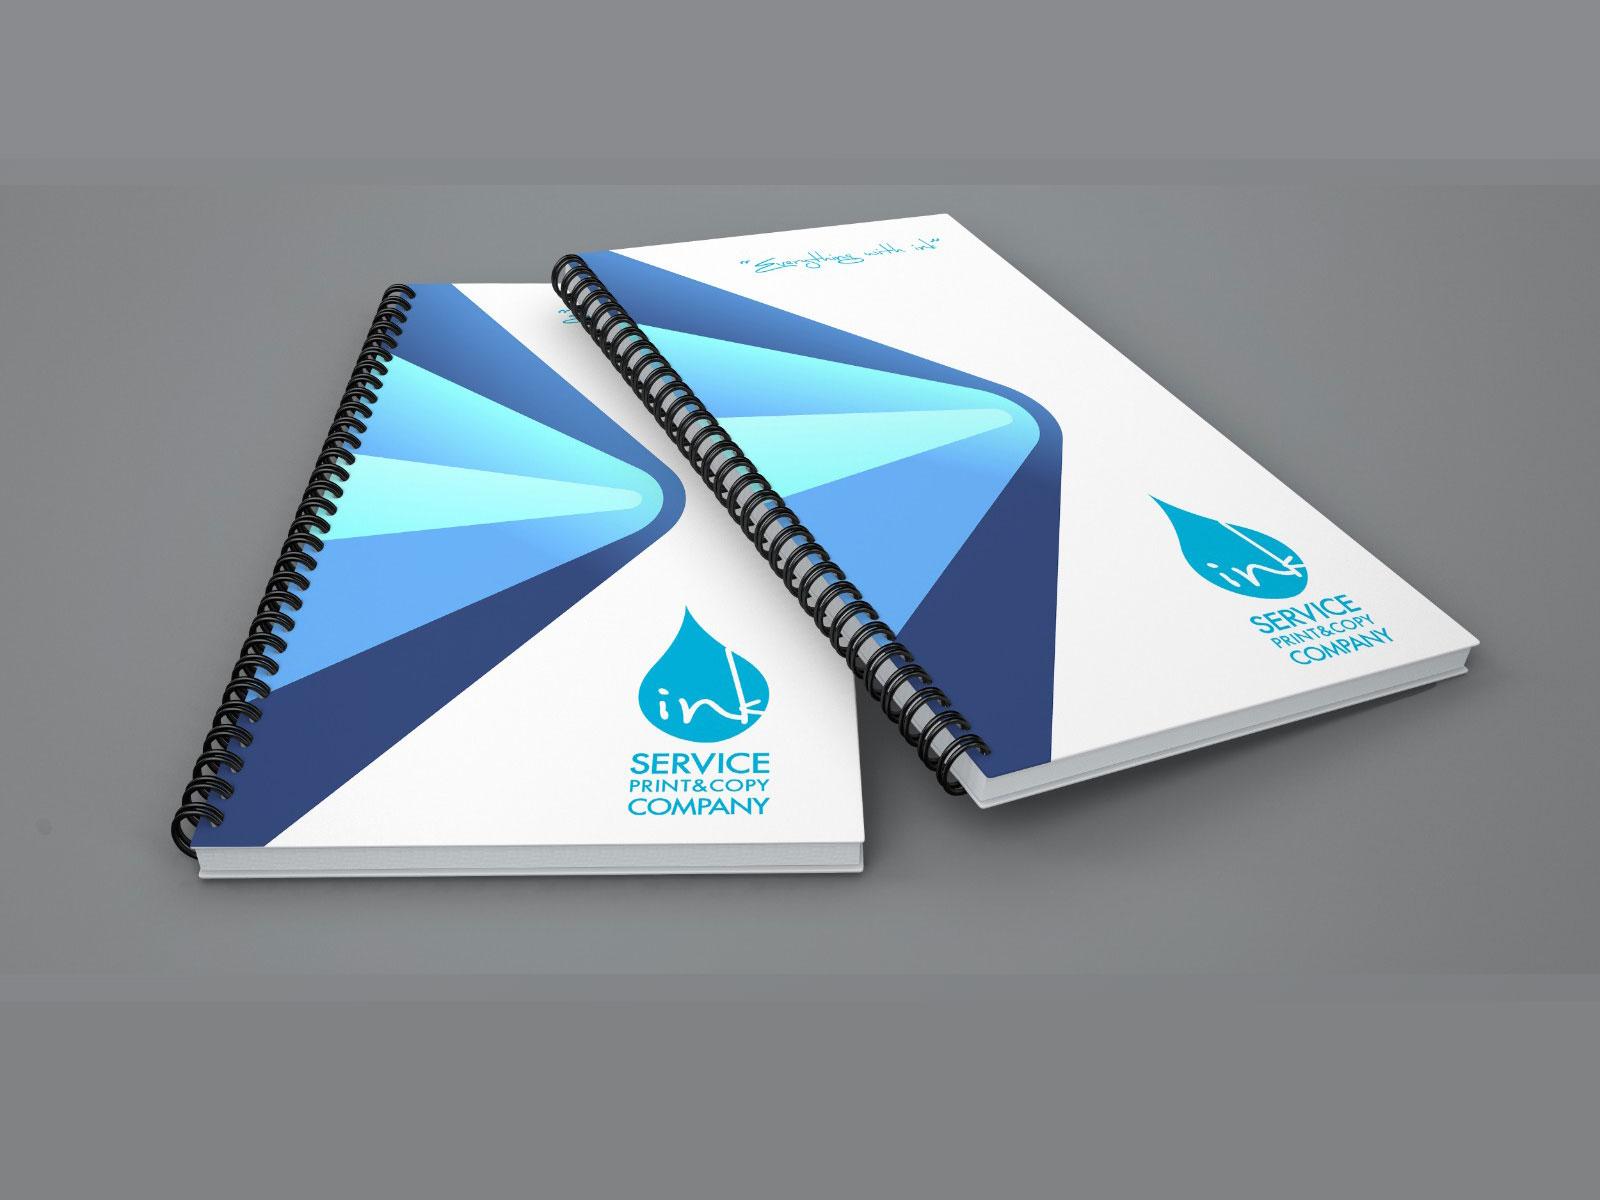 Booklet_02_inkservice-kuwait